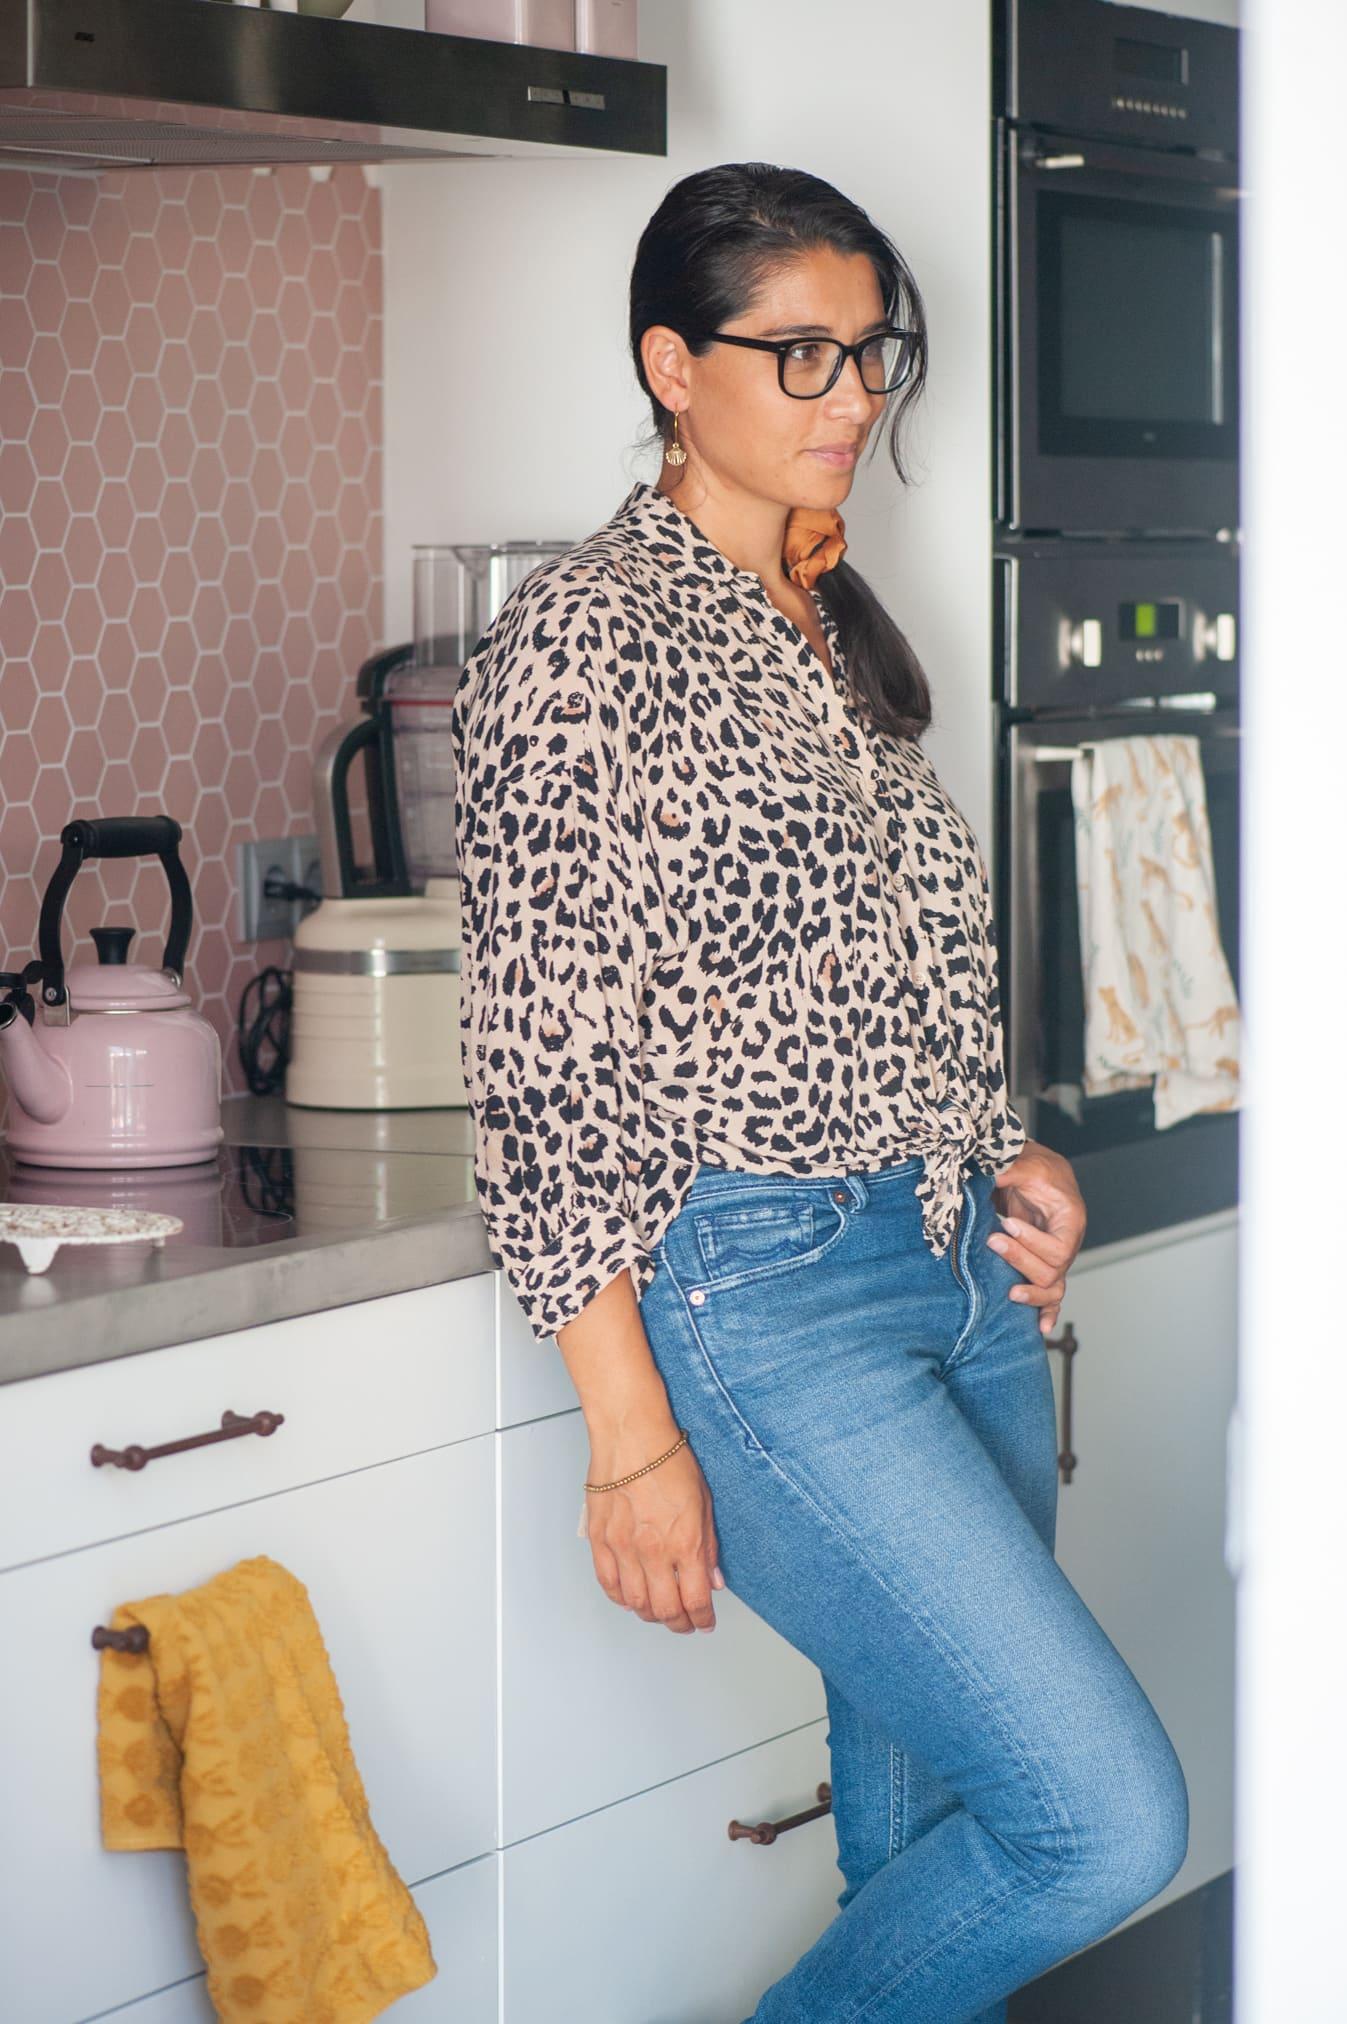 interieurblogger in keuken